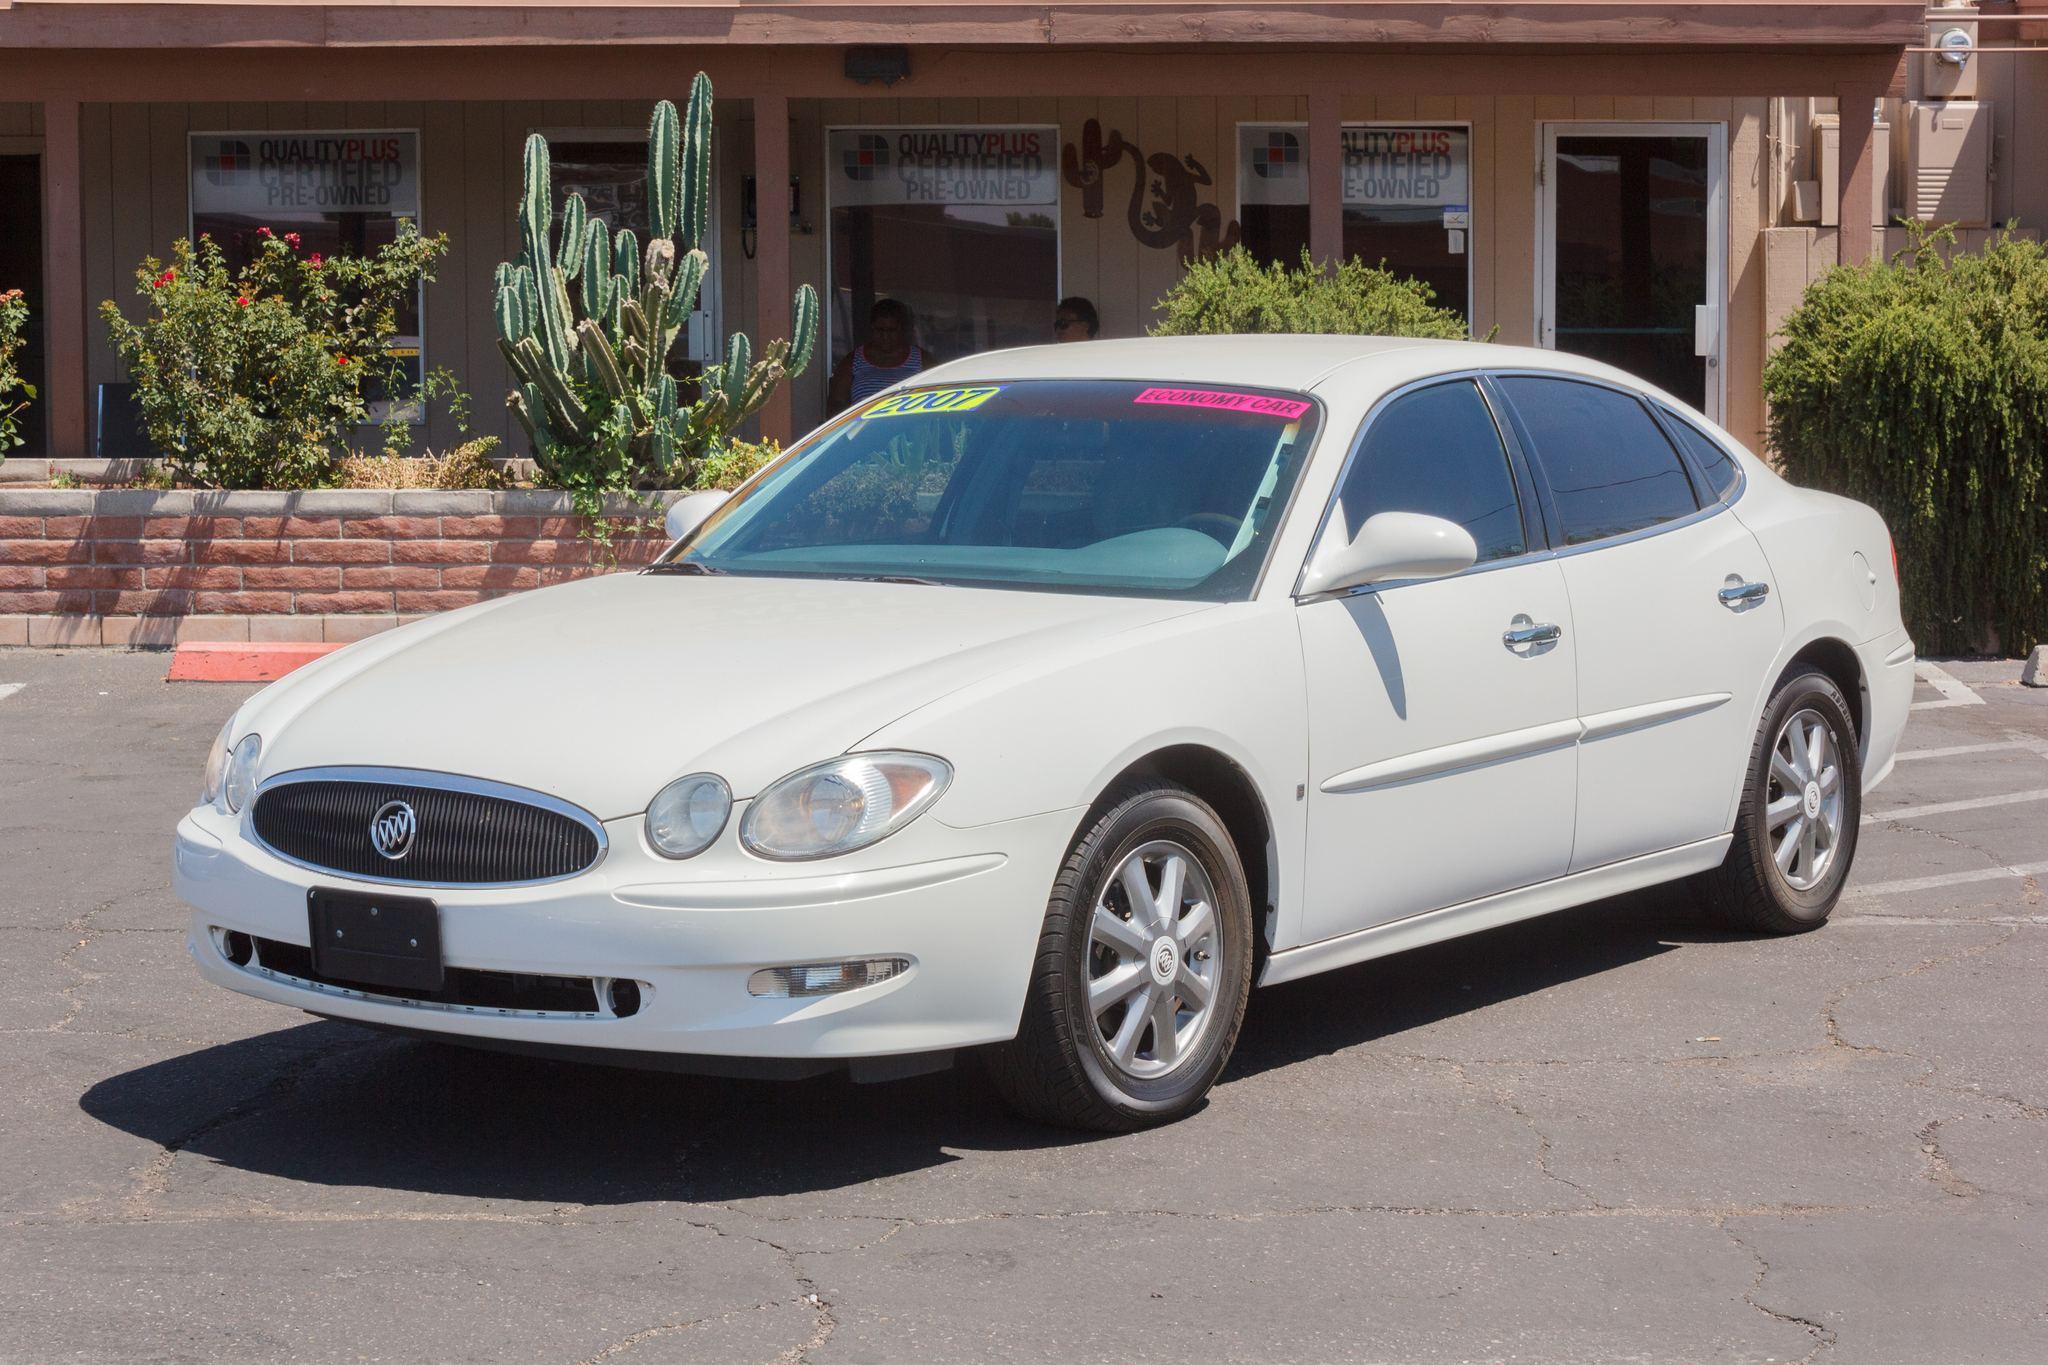 Photo of 2007 Buick LaCrosse 4d Sedan CXL White Opal